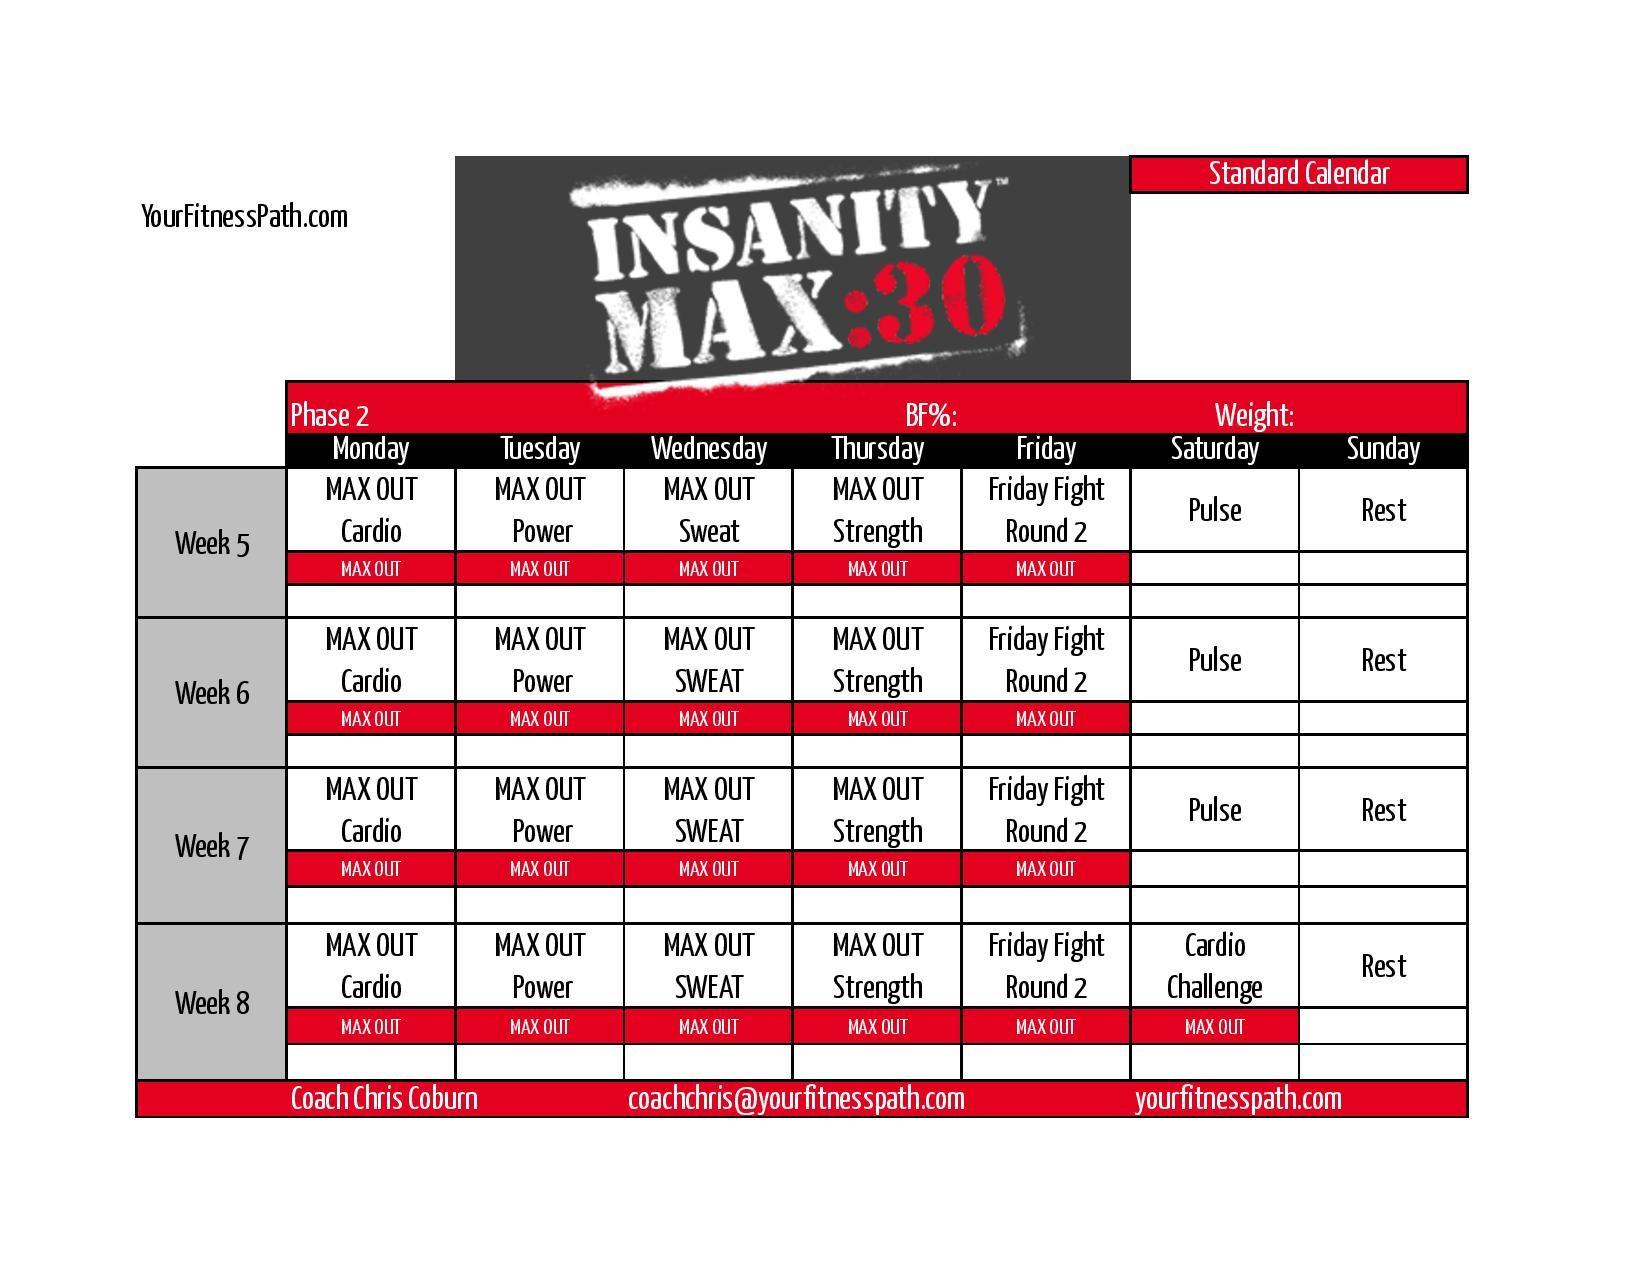 Insanity Max 30 Calendar Month 2 Regular Https Www Youcalendars Com Insanity Max 30 Calendar Html Insanity Max Insanity Max 30 Insanity Max 30 Calendar